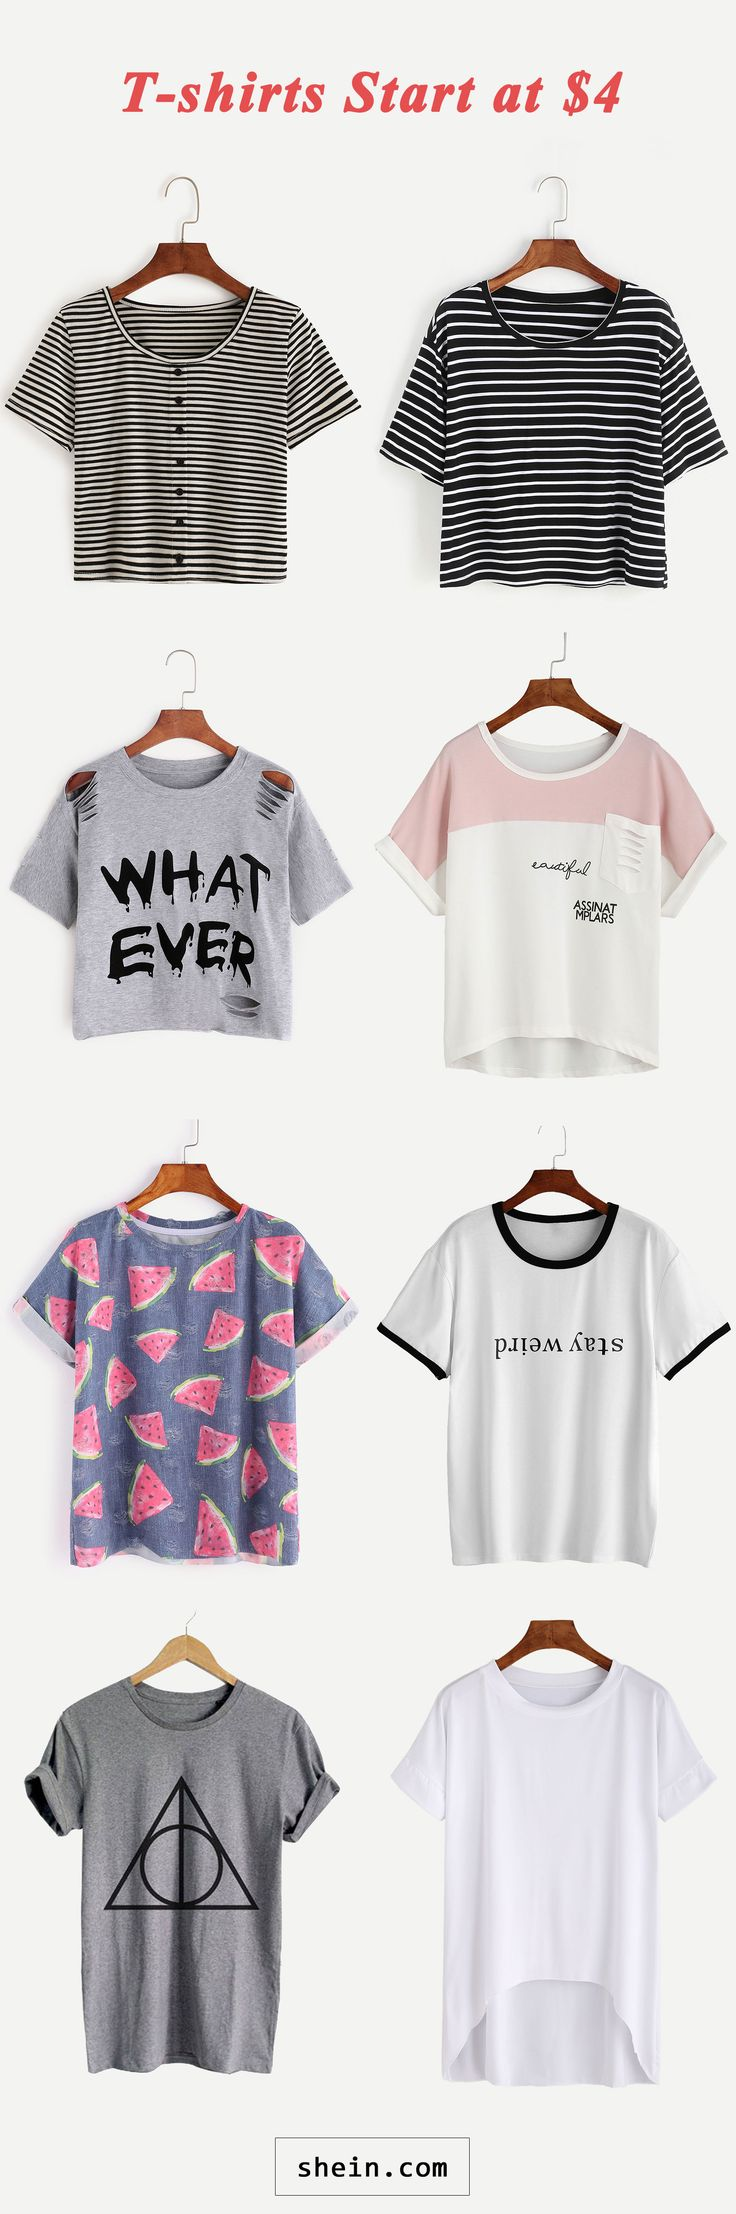 T shirts start at $4!